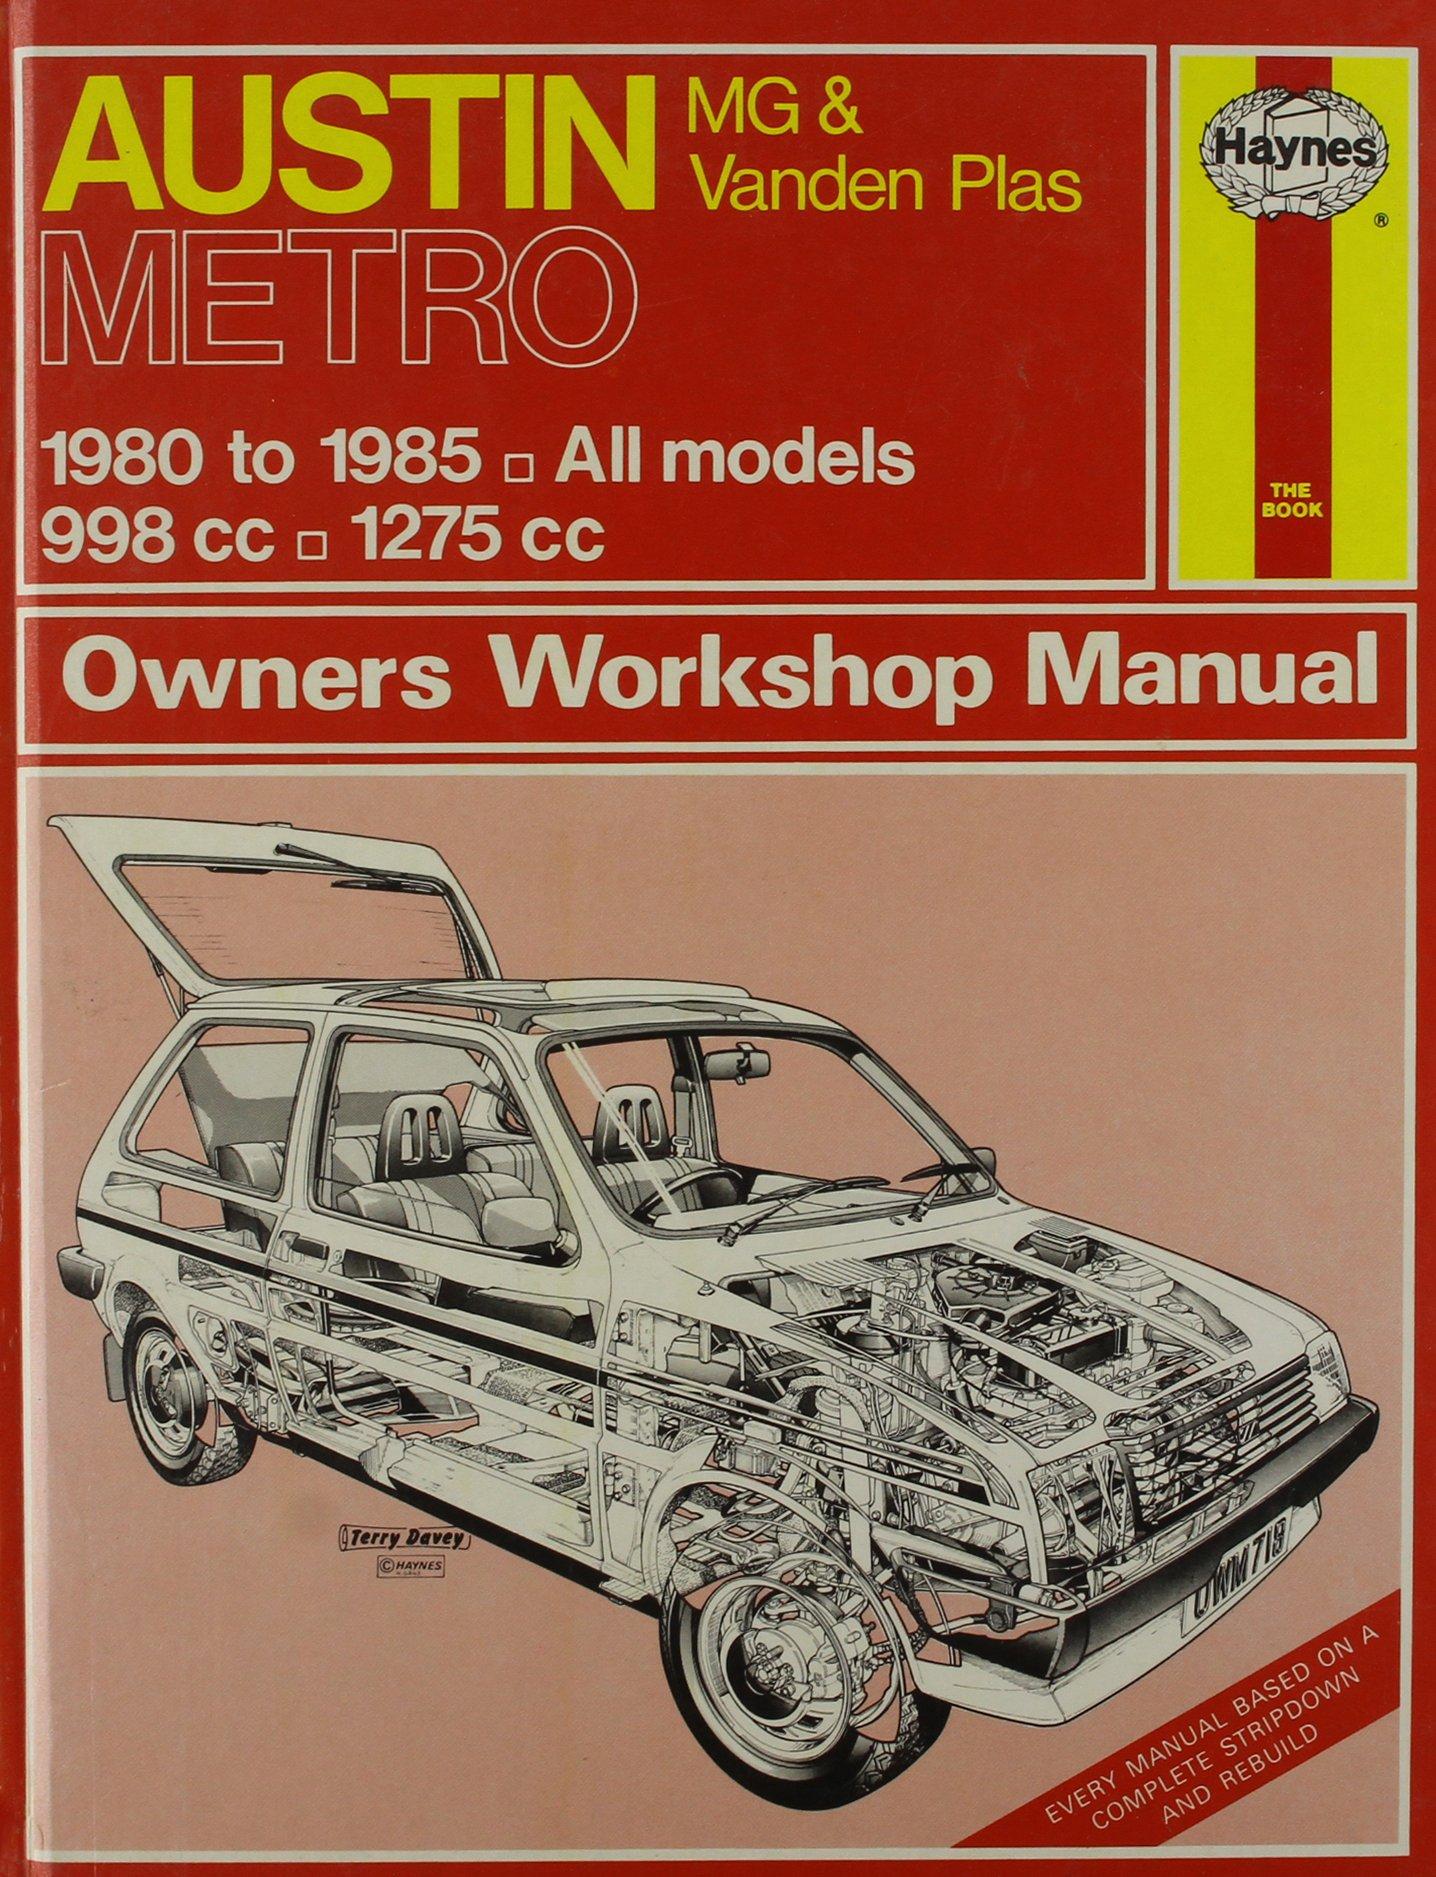 Austin Metro, MG and Vanden Plas 1980-86 All Models Owners Workshop Manual: Amazon.es: A. K. Legg: Libros en idiomas extranjeros